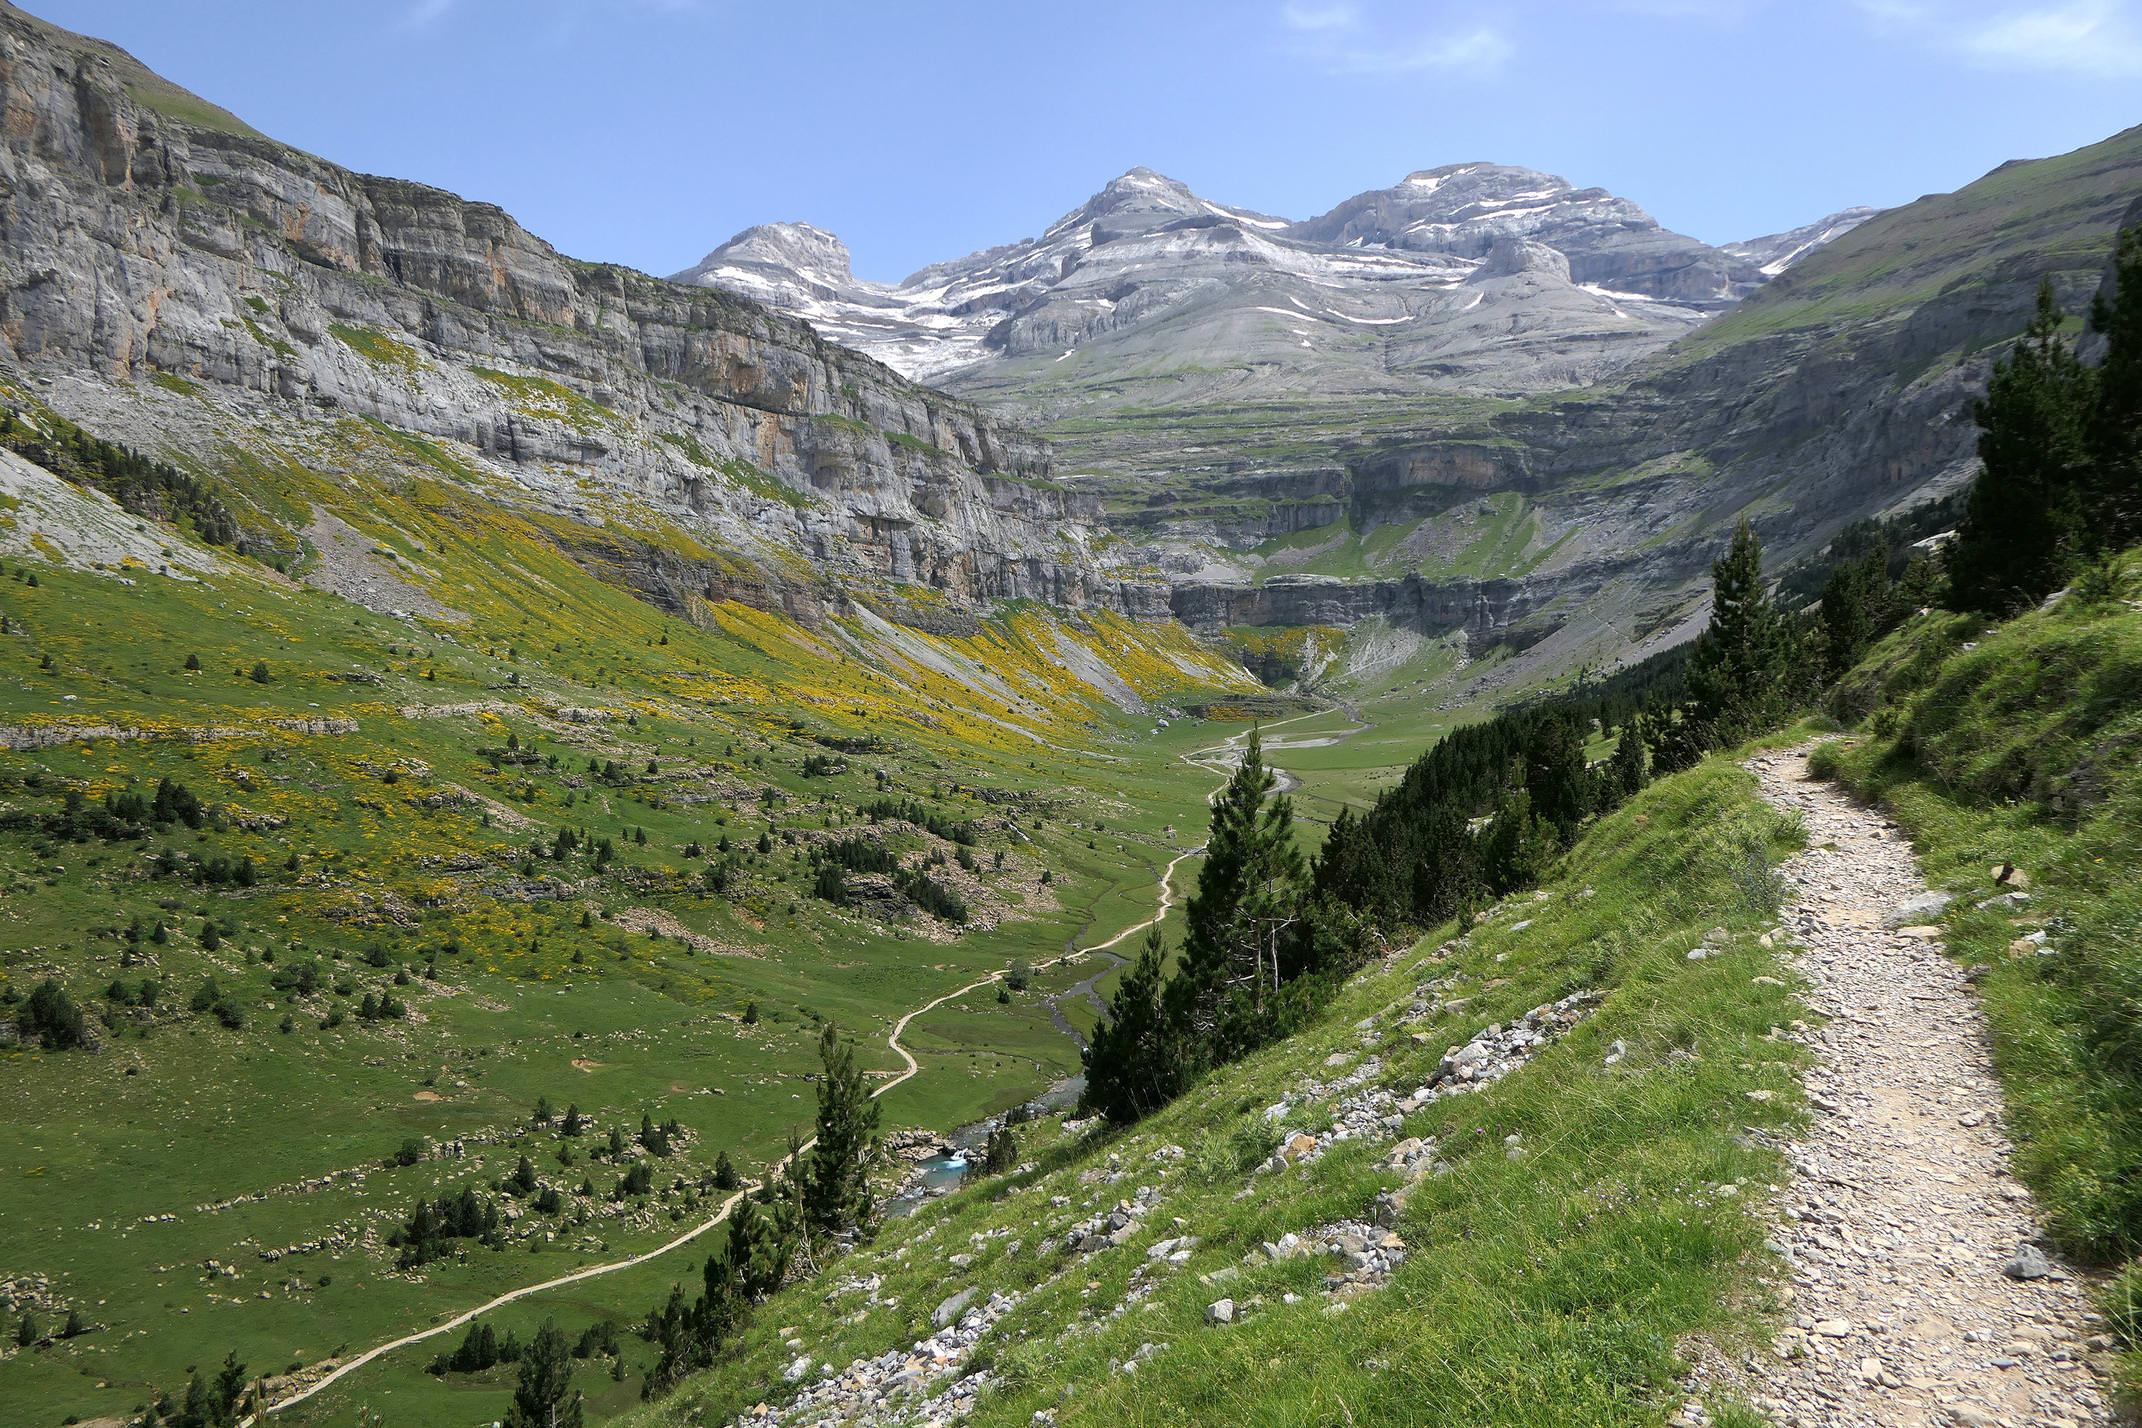 Spain huesca aragon pyrenees ordesa empty trail upper valley monte perdido from faja pelayo c diego